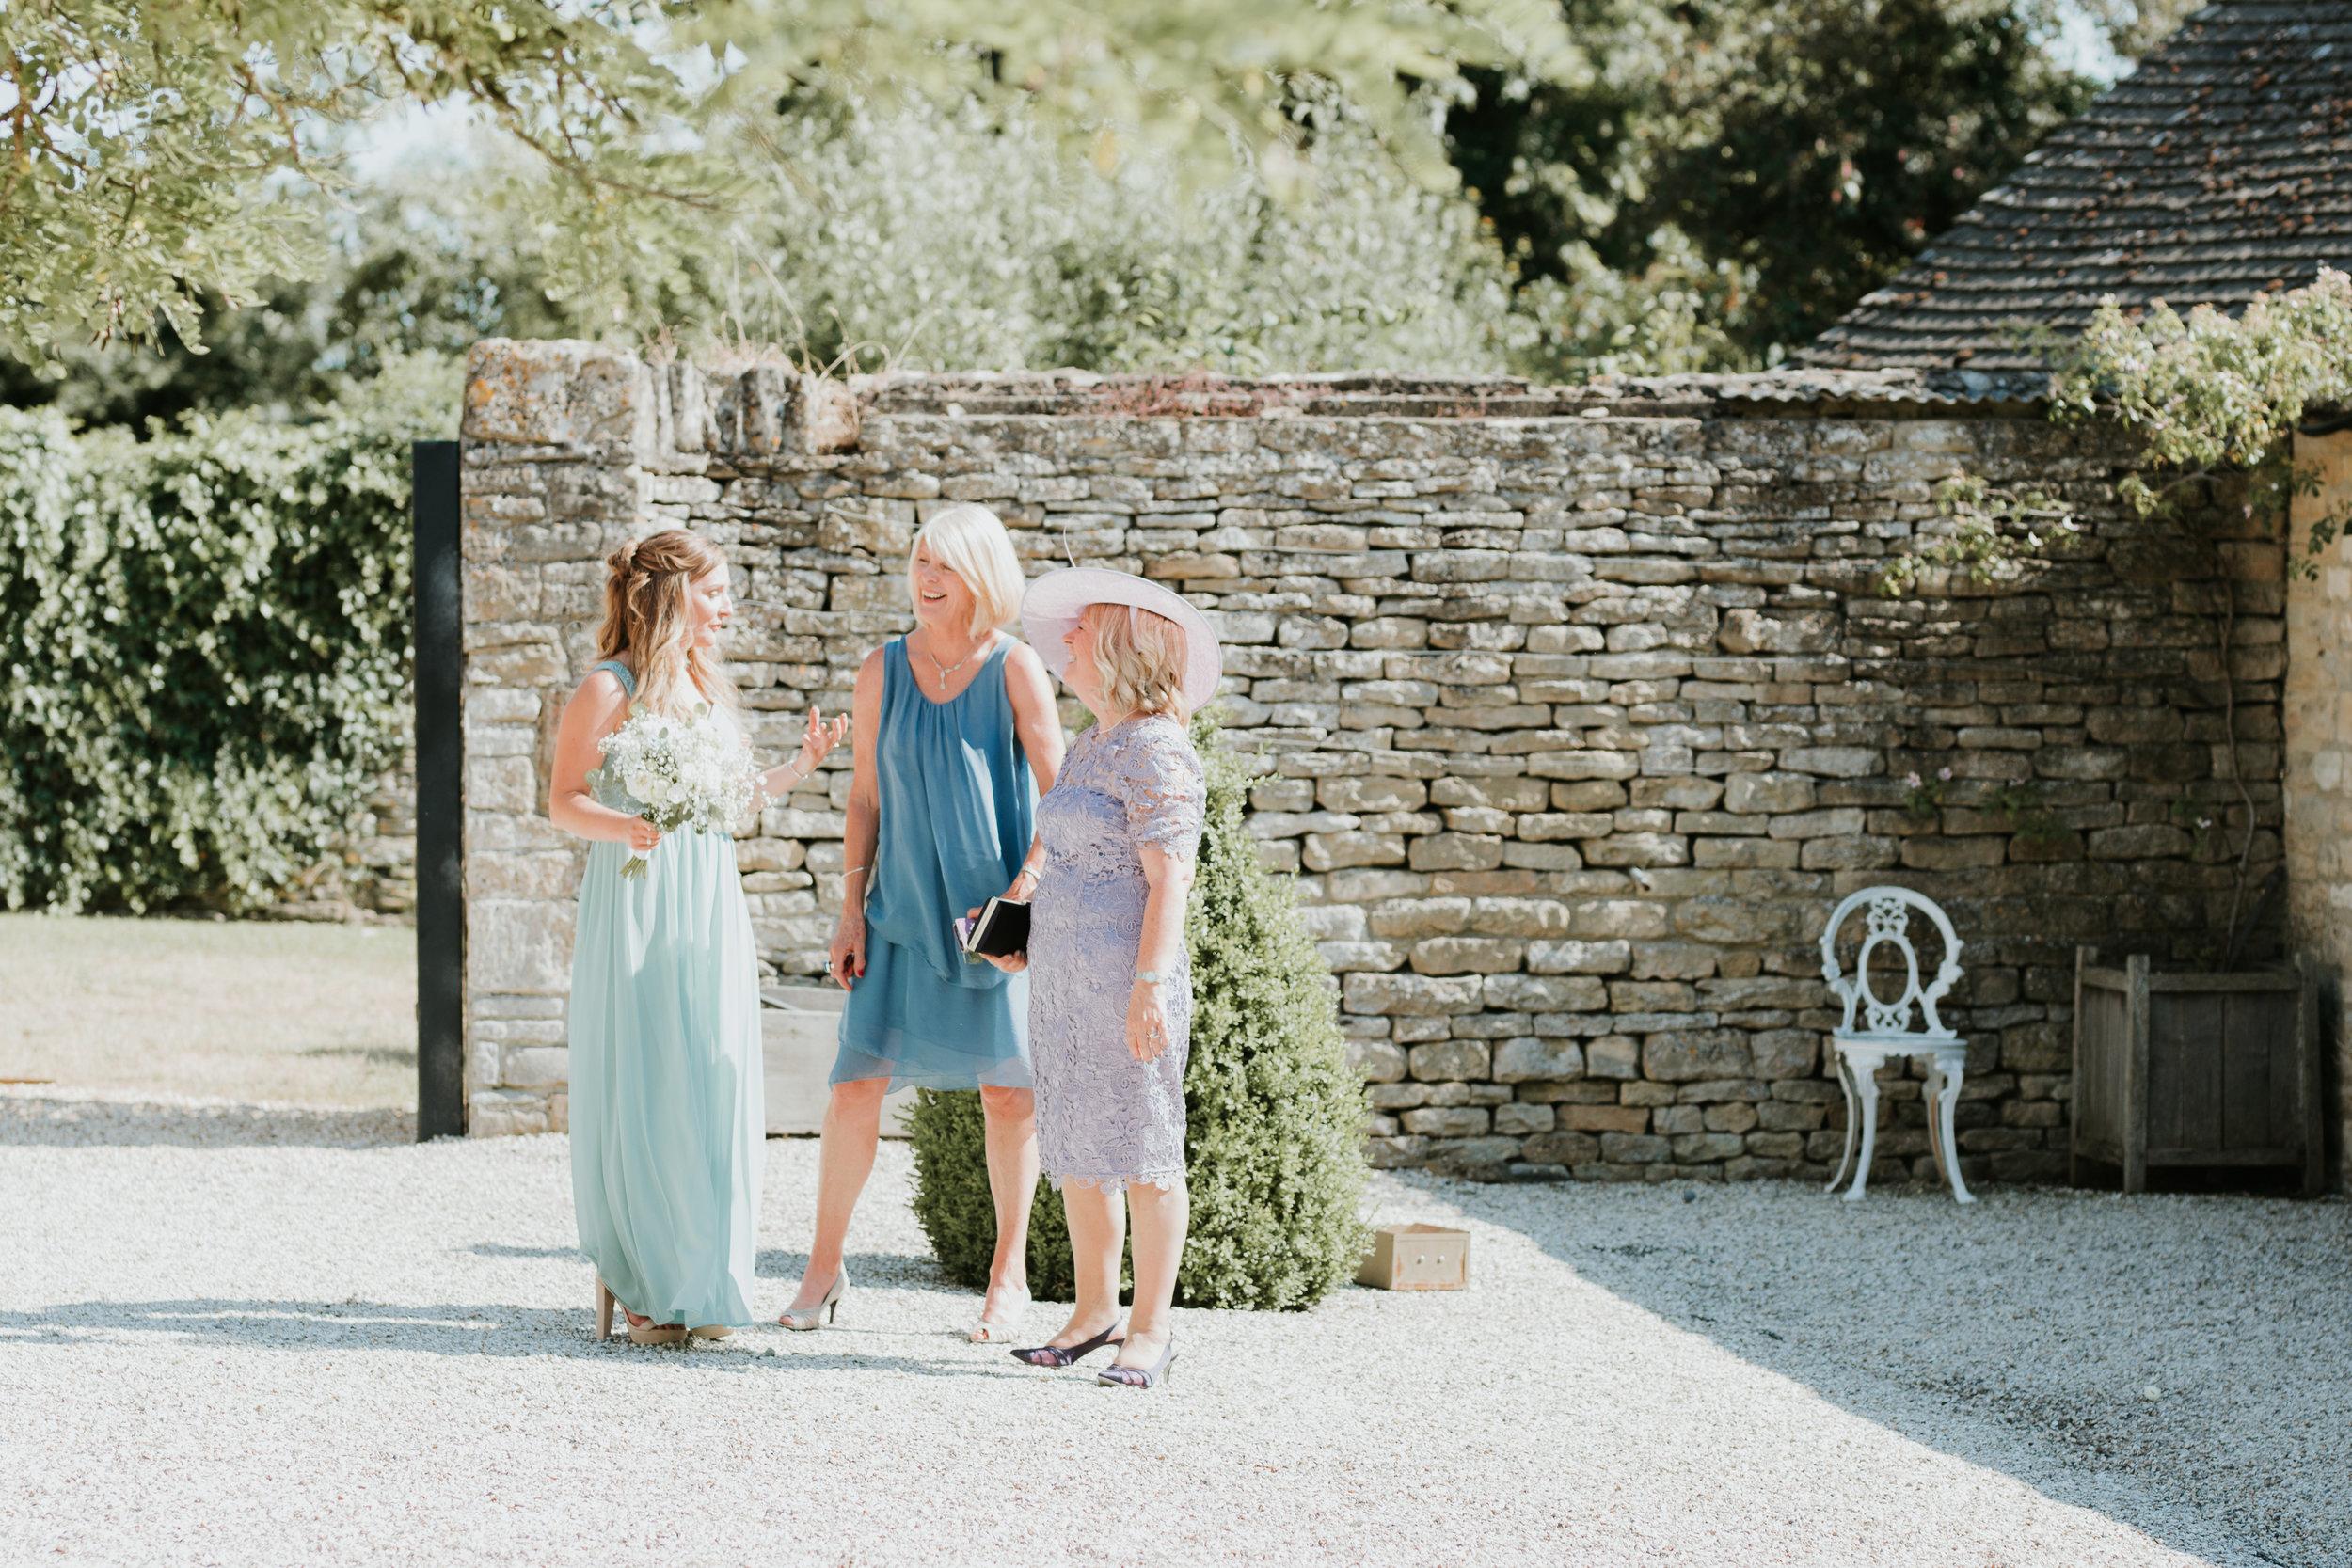 Oxfordshire-wedding-photographer-55.jpg